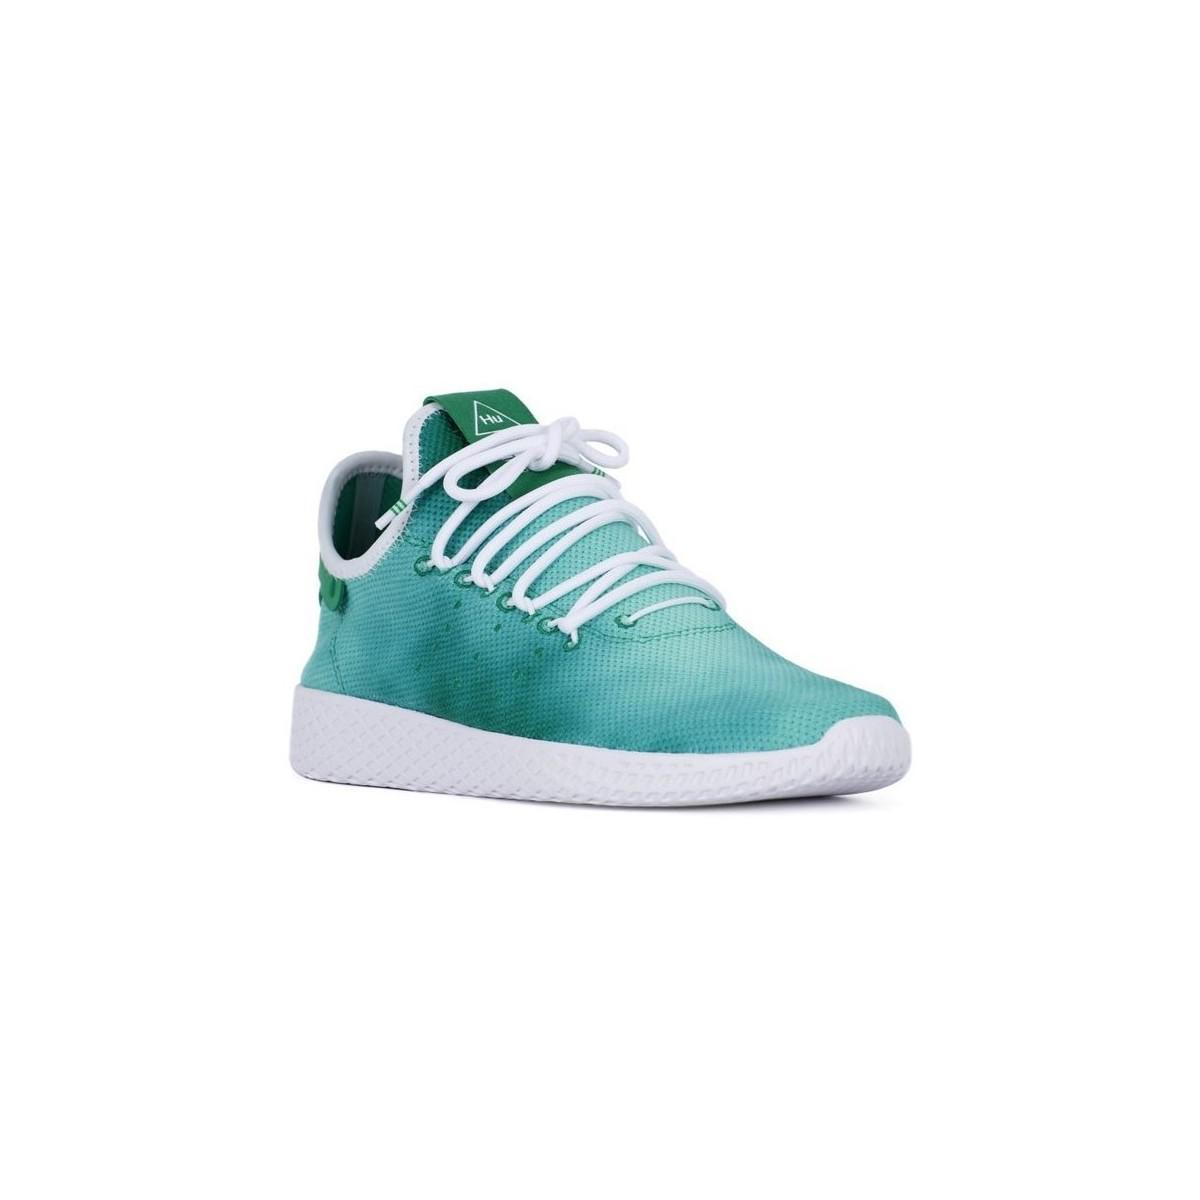 b97027906 Adidas Pharrell Williams Hu Holi Tennis Men s Shoes (trainers) In ...